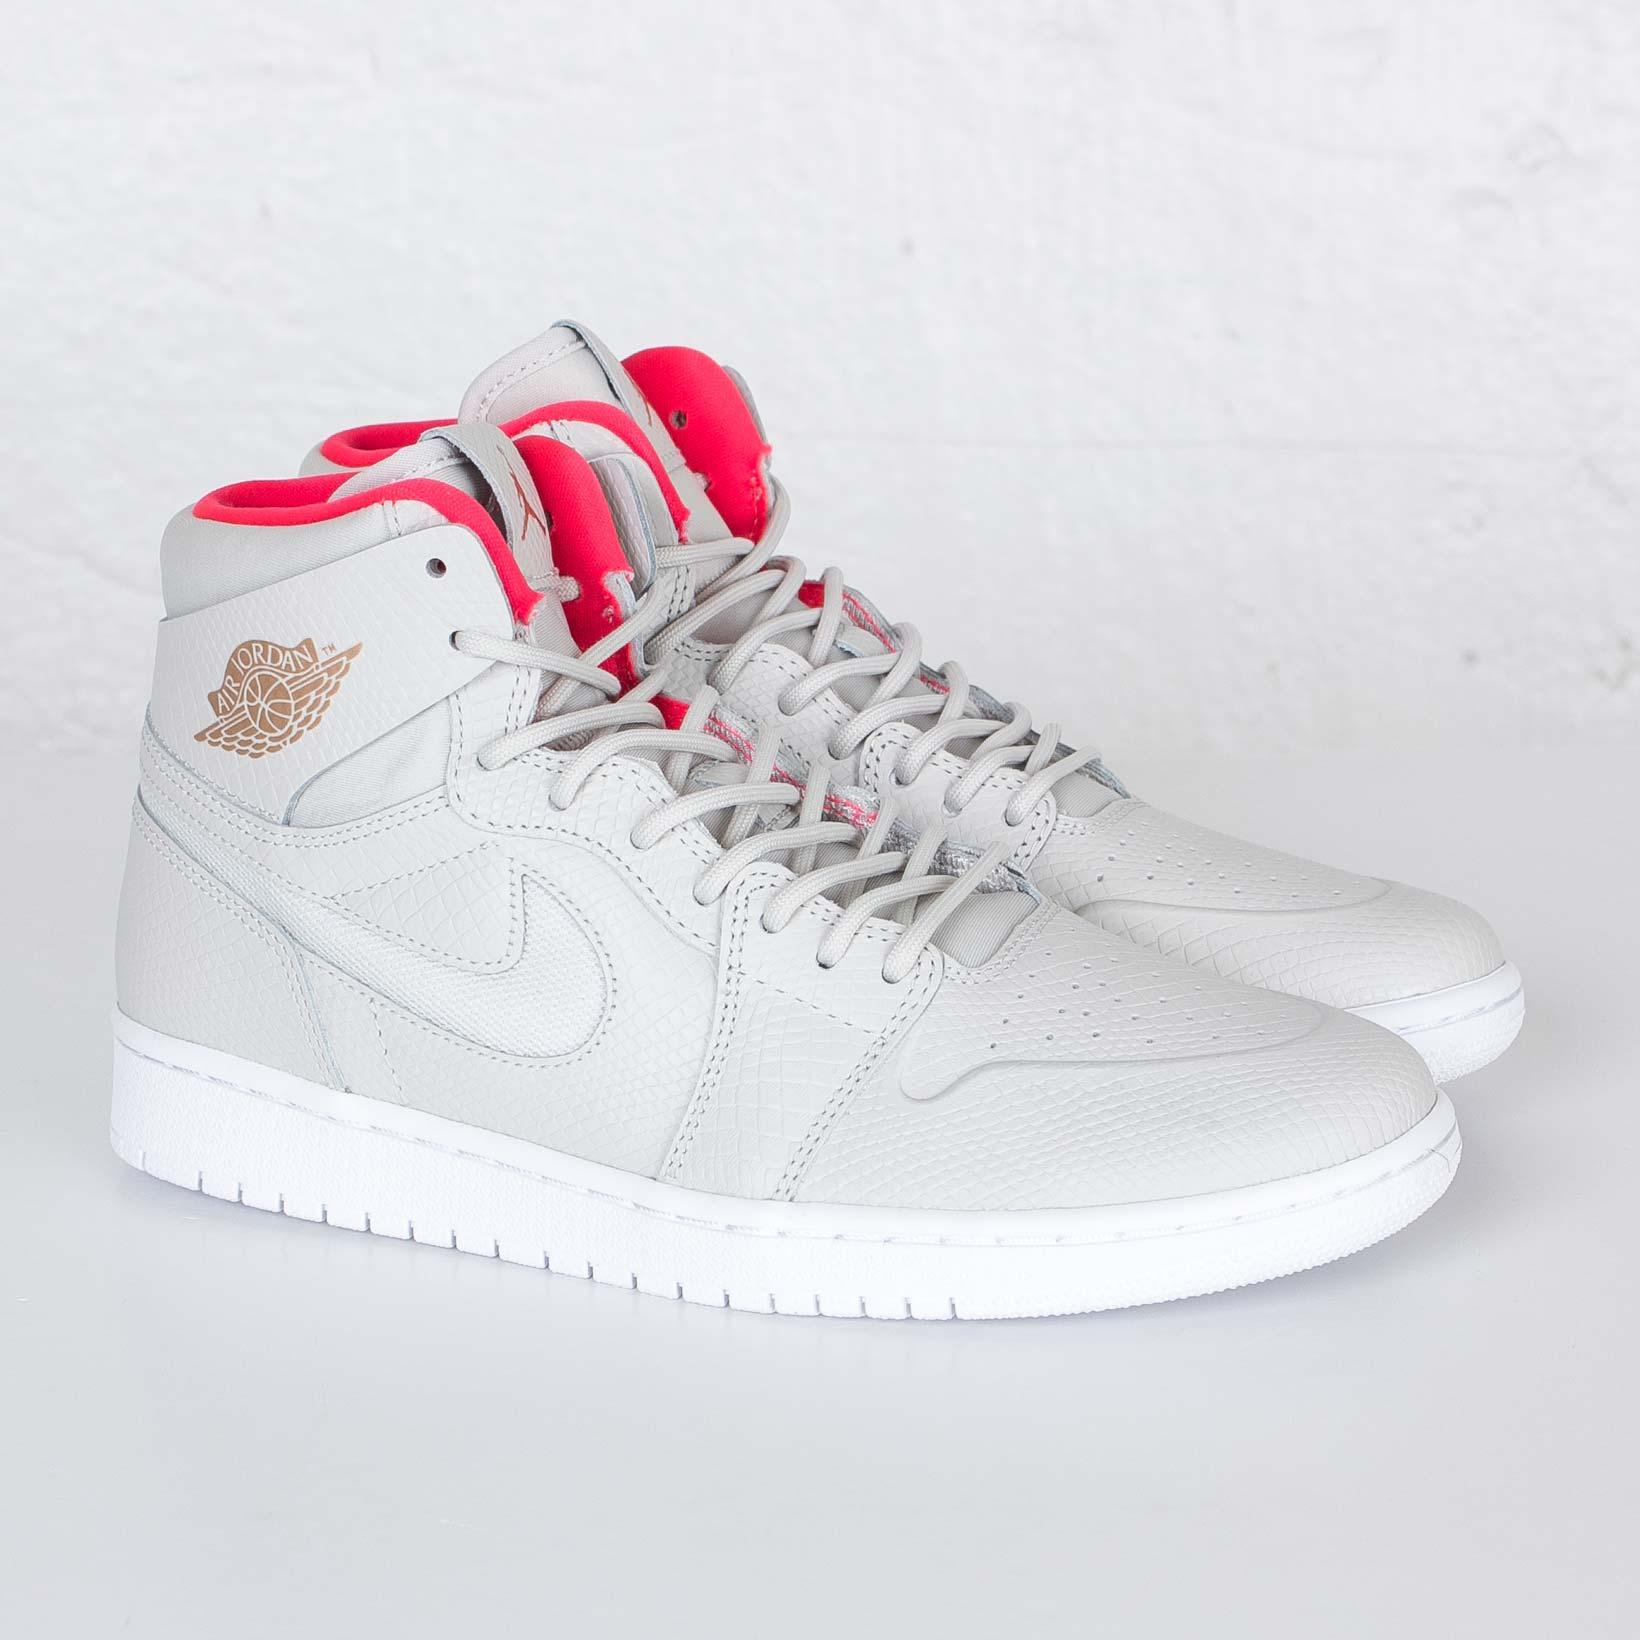 Jordan Brand Air Jordan 1 Retro High Noveau - 819176-050 ... 950fc6ebe